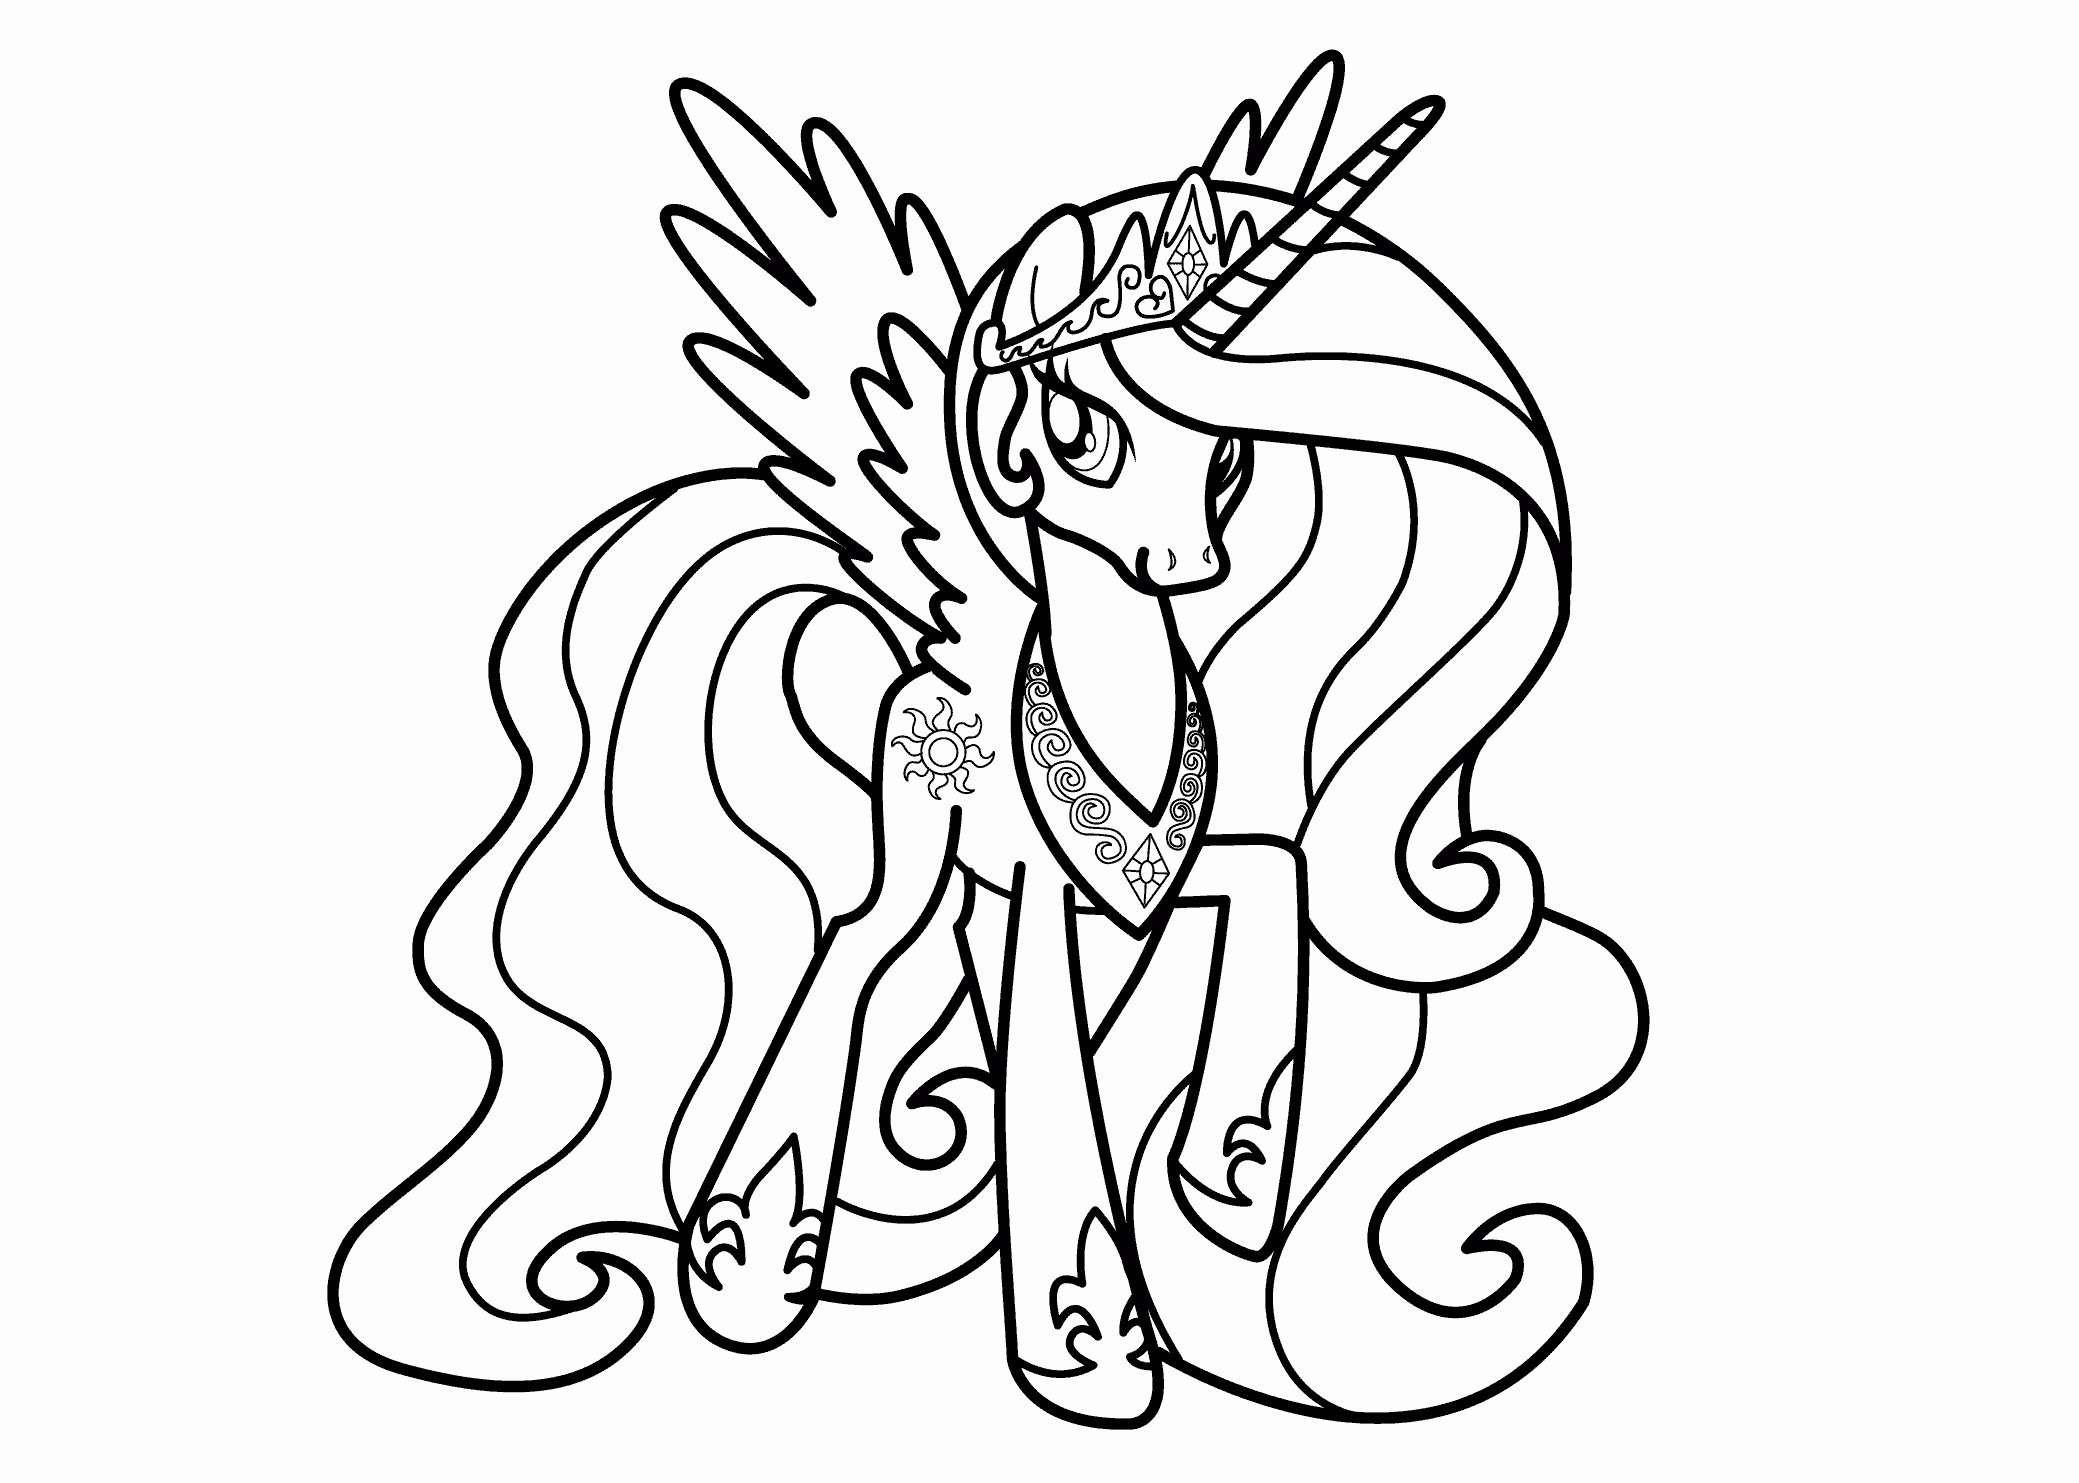 Rainbow Dash Ausmalbilder Genial Rainbow Dash Stencil Lovely Princess Rarityloring Page Little Pony Das Bild